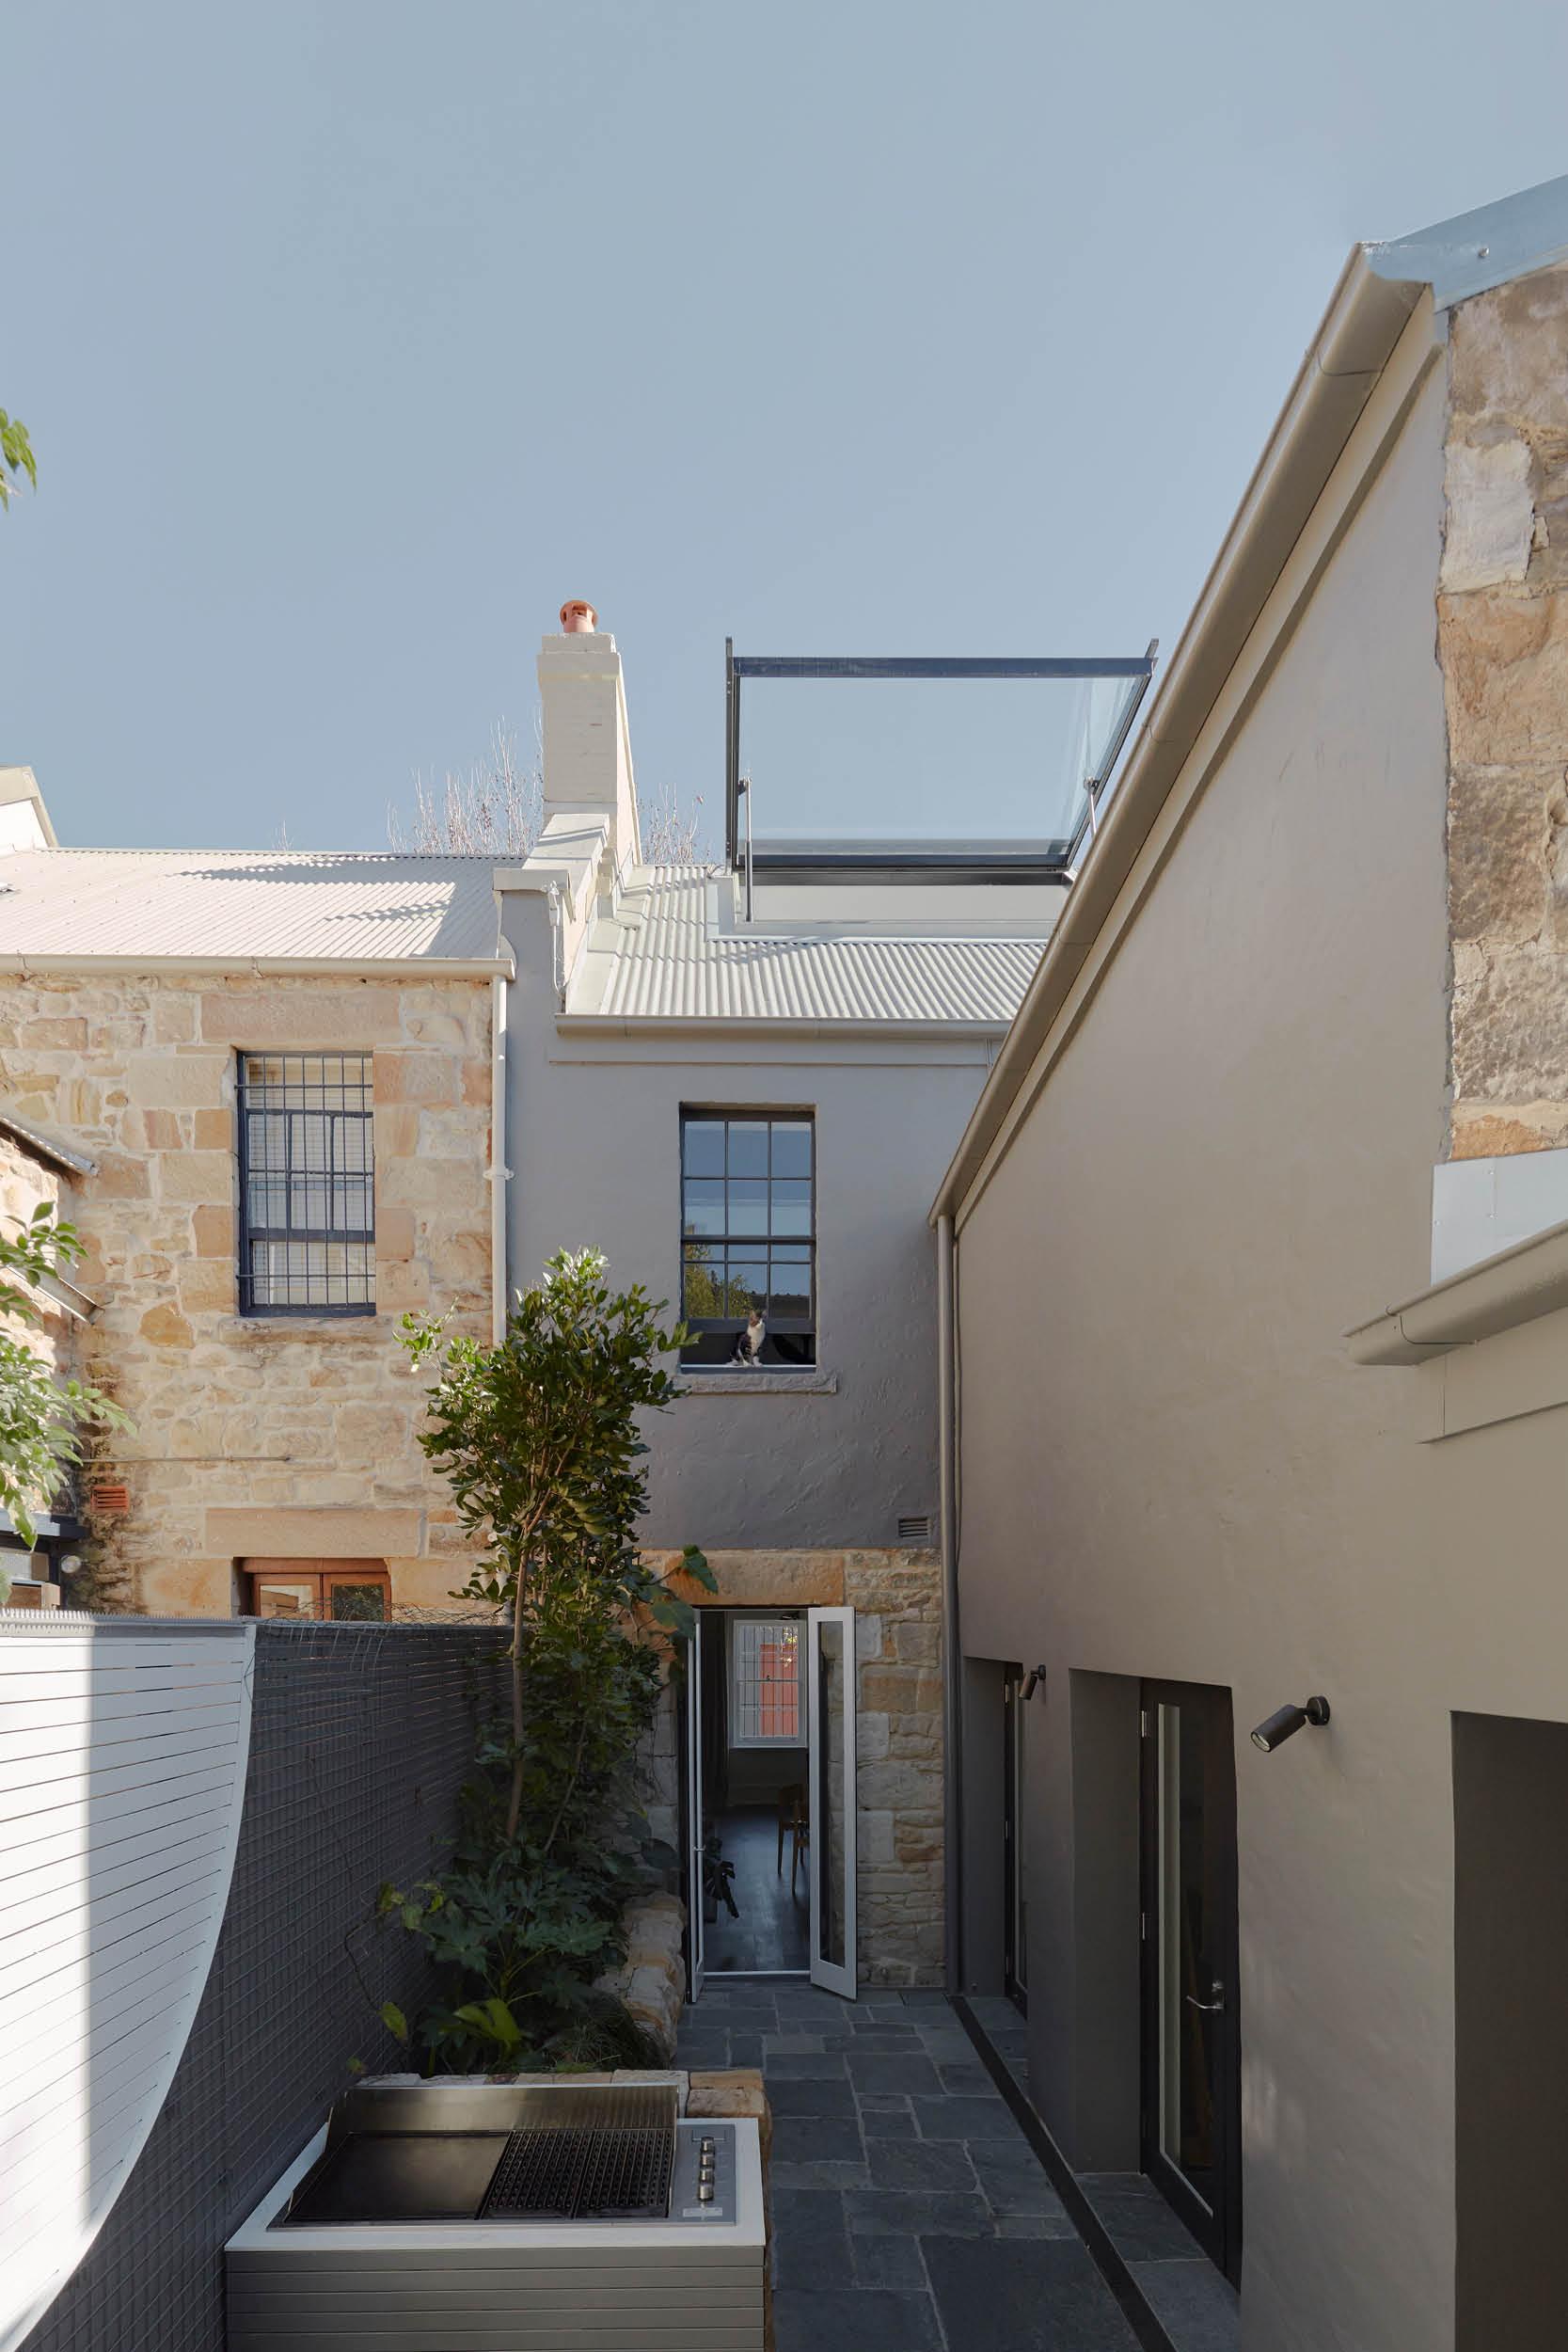 Terrace-ventilation-skylight-darlinghurst-Heritage-residential-home-custom-designed-skylight-increase-natural-light featured houses awards